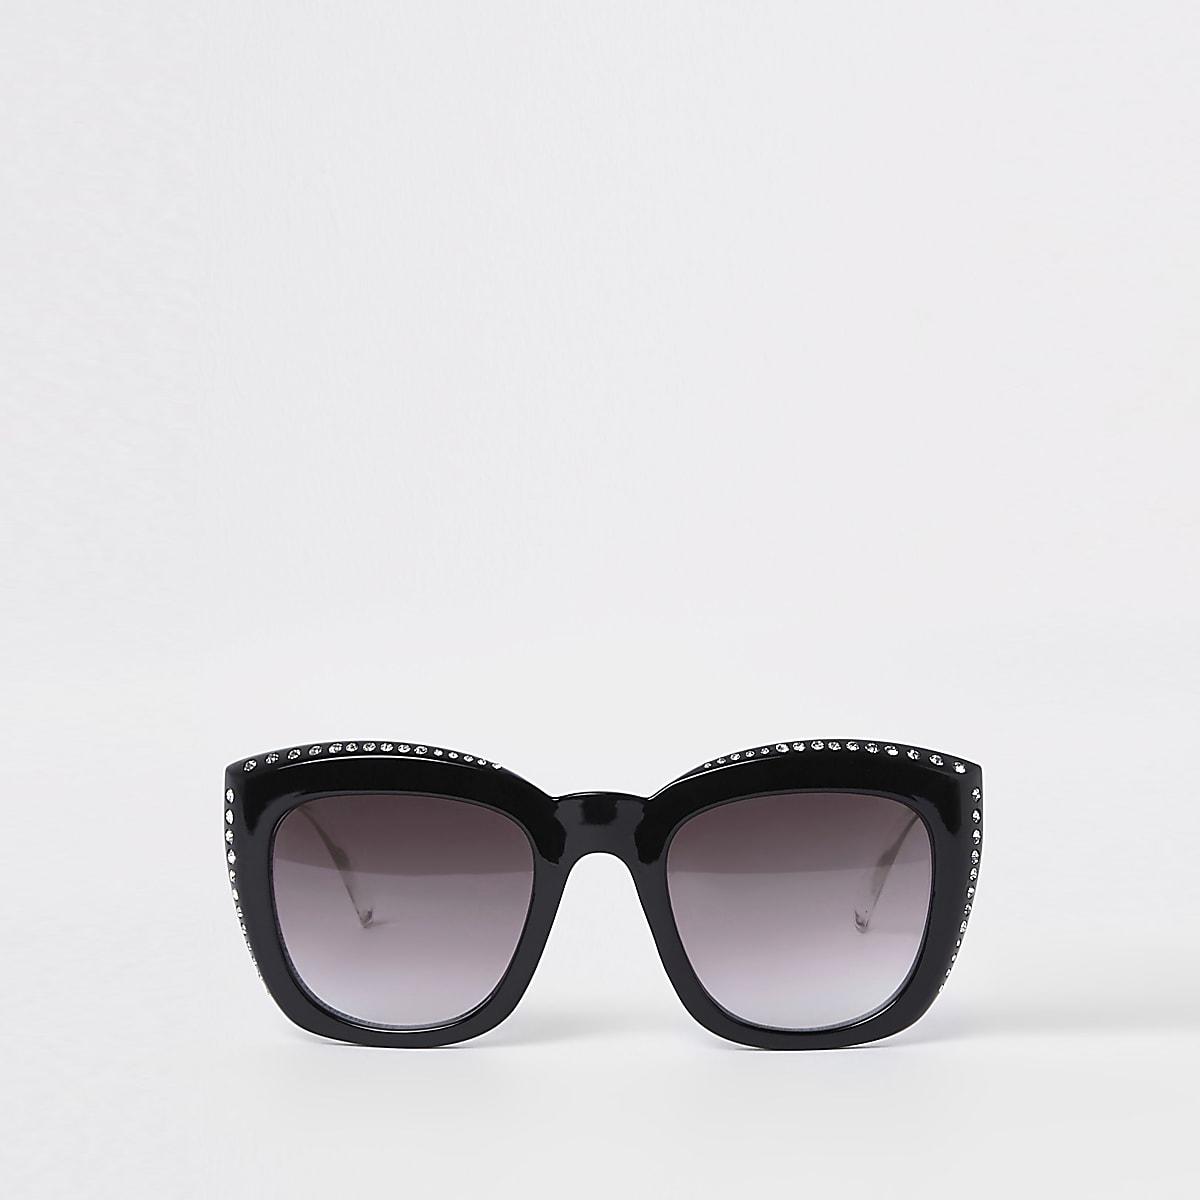 Black rhinestone studded glam sunglasses